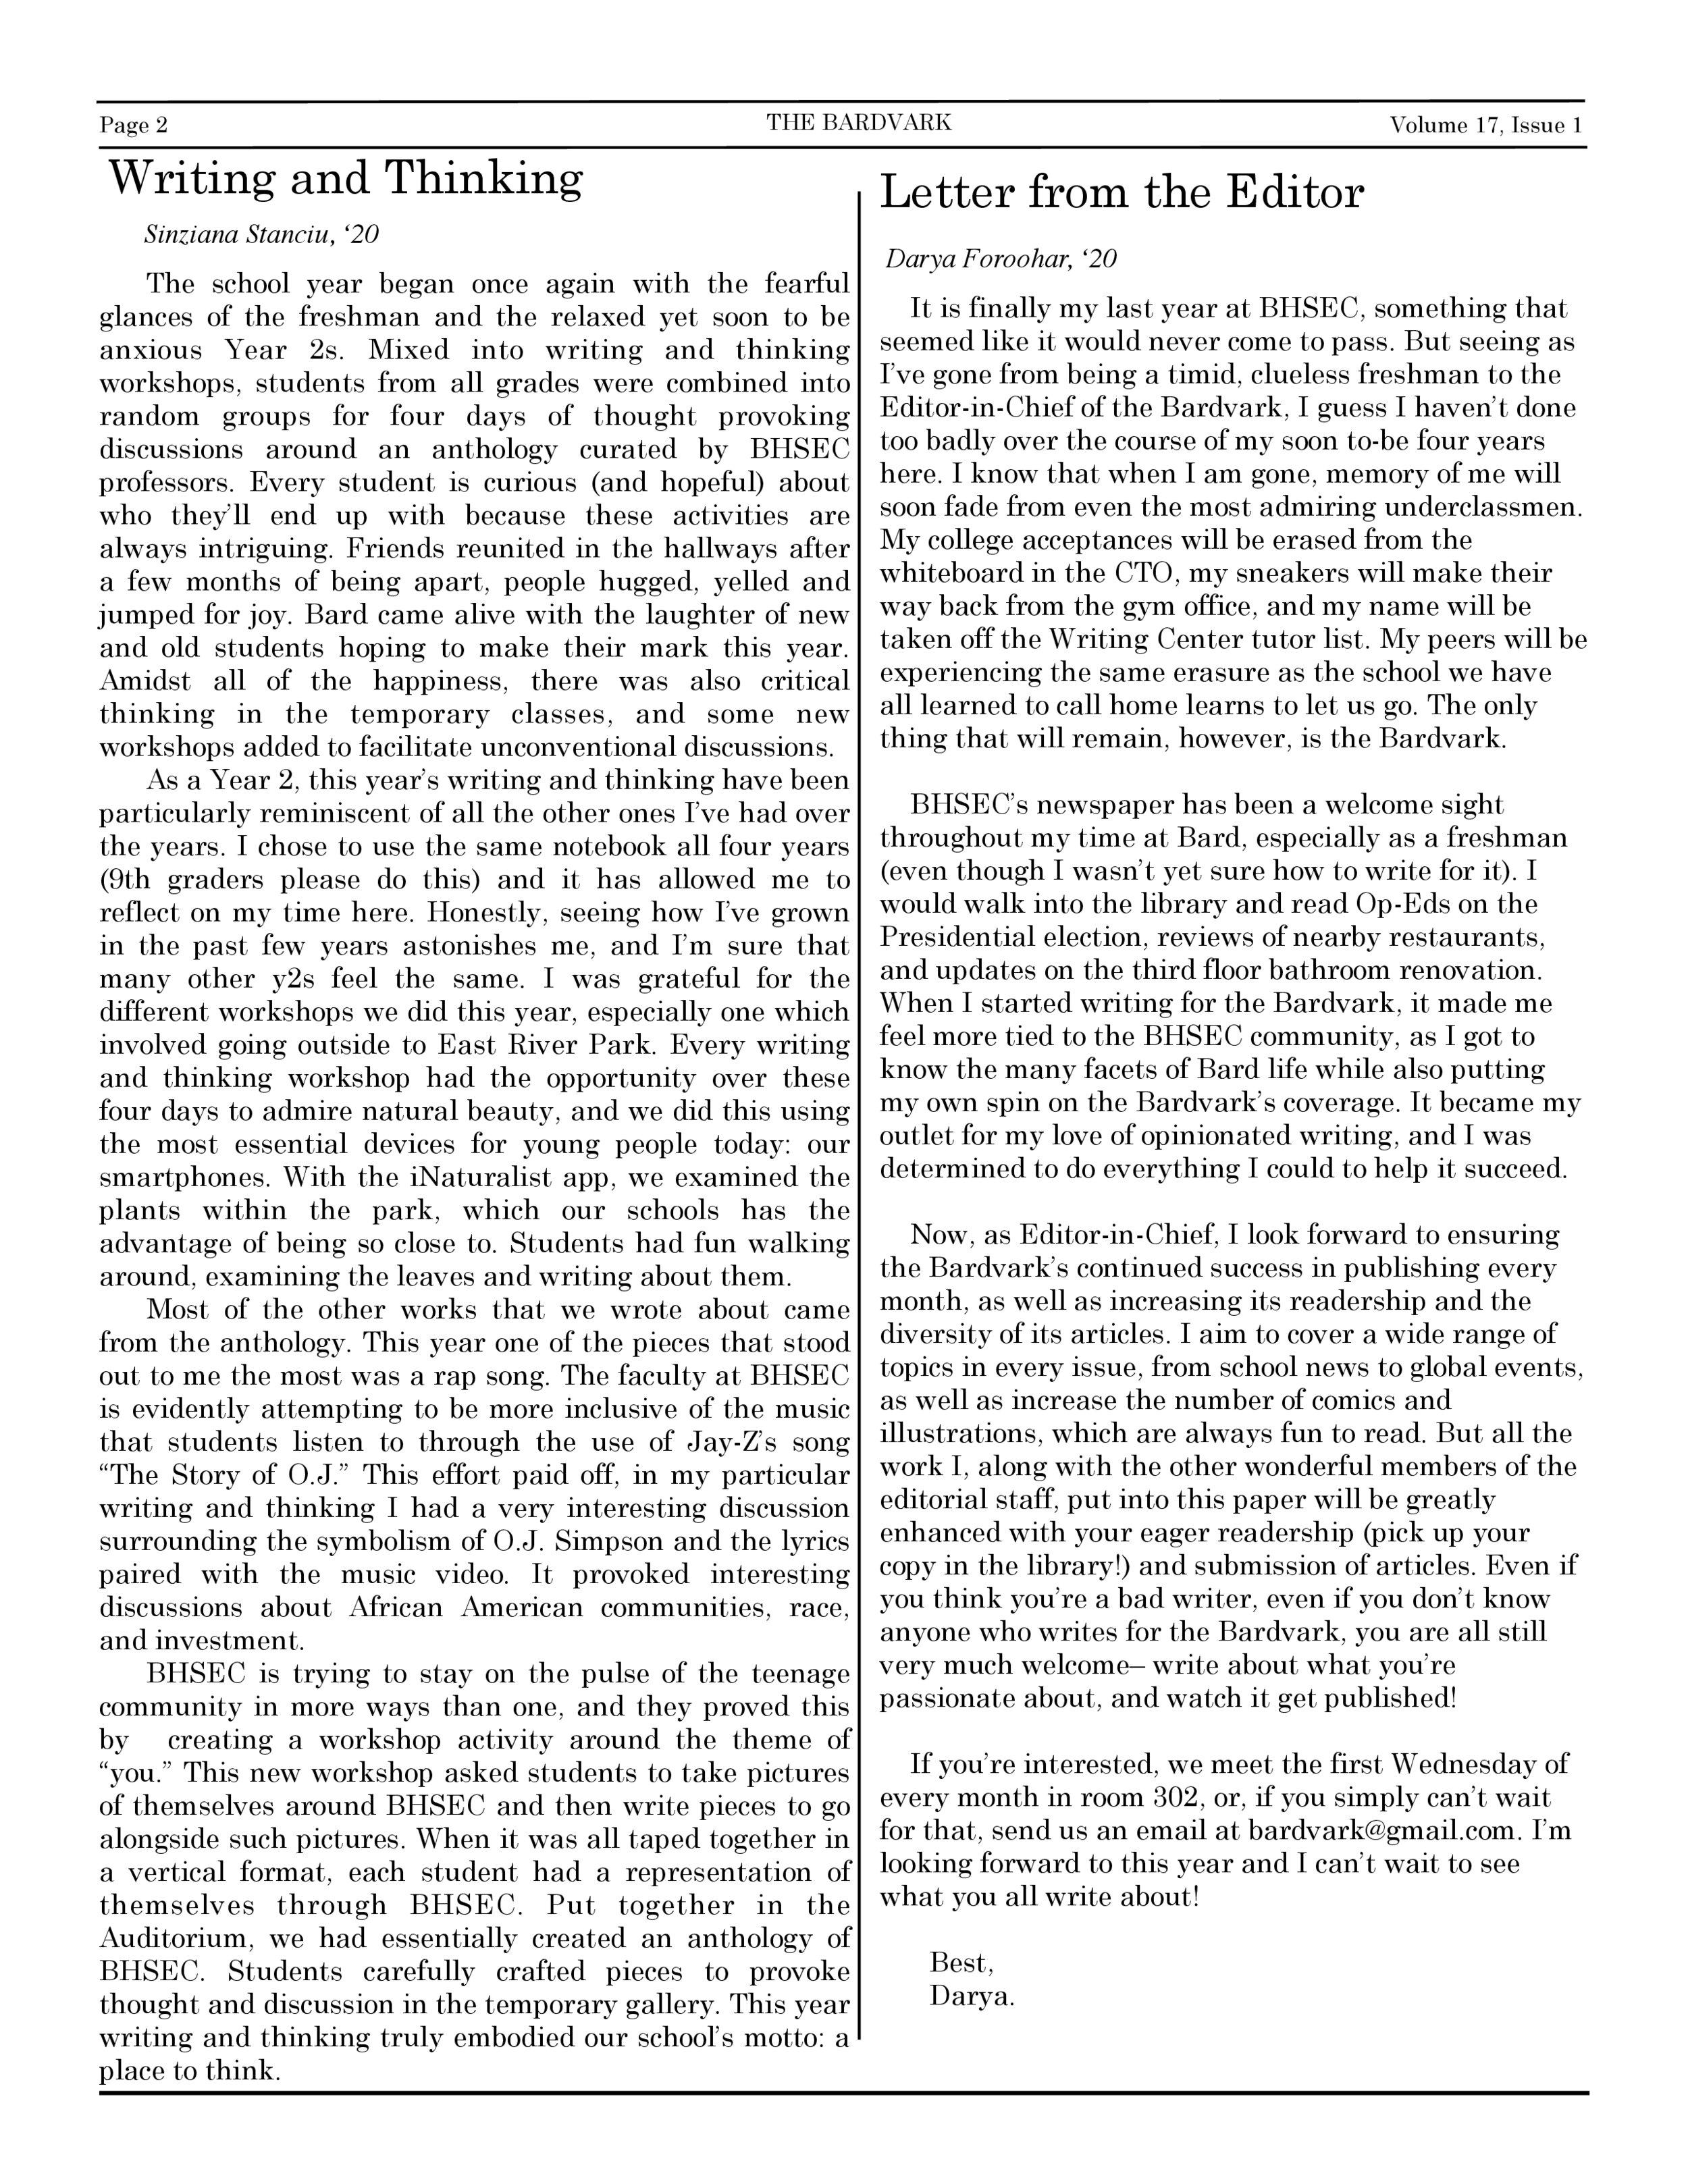 Bardvark Vol 17.1 2-2.jpg